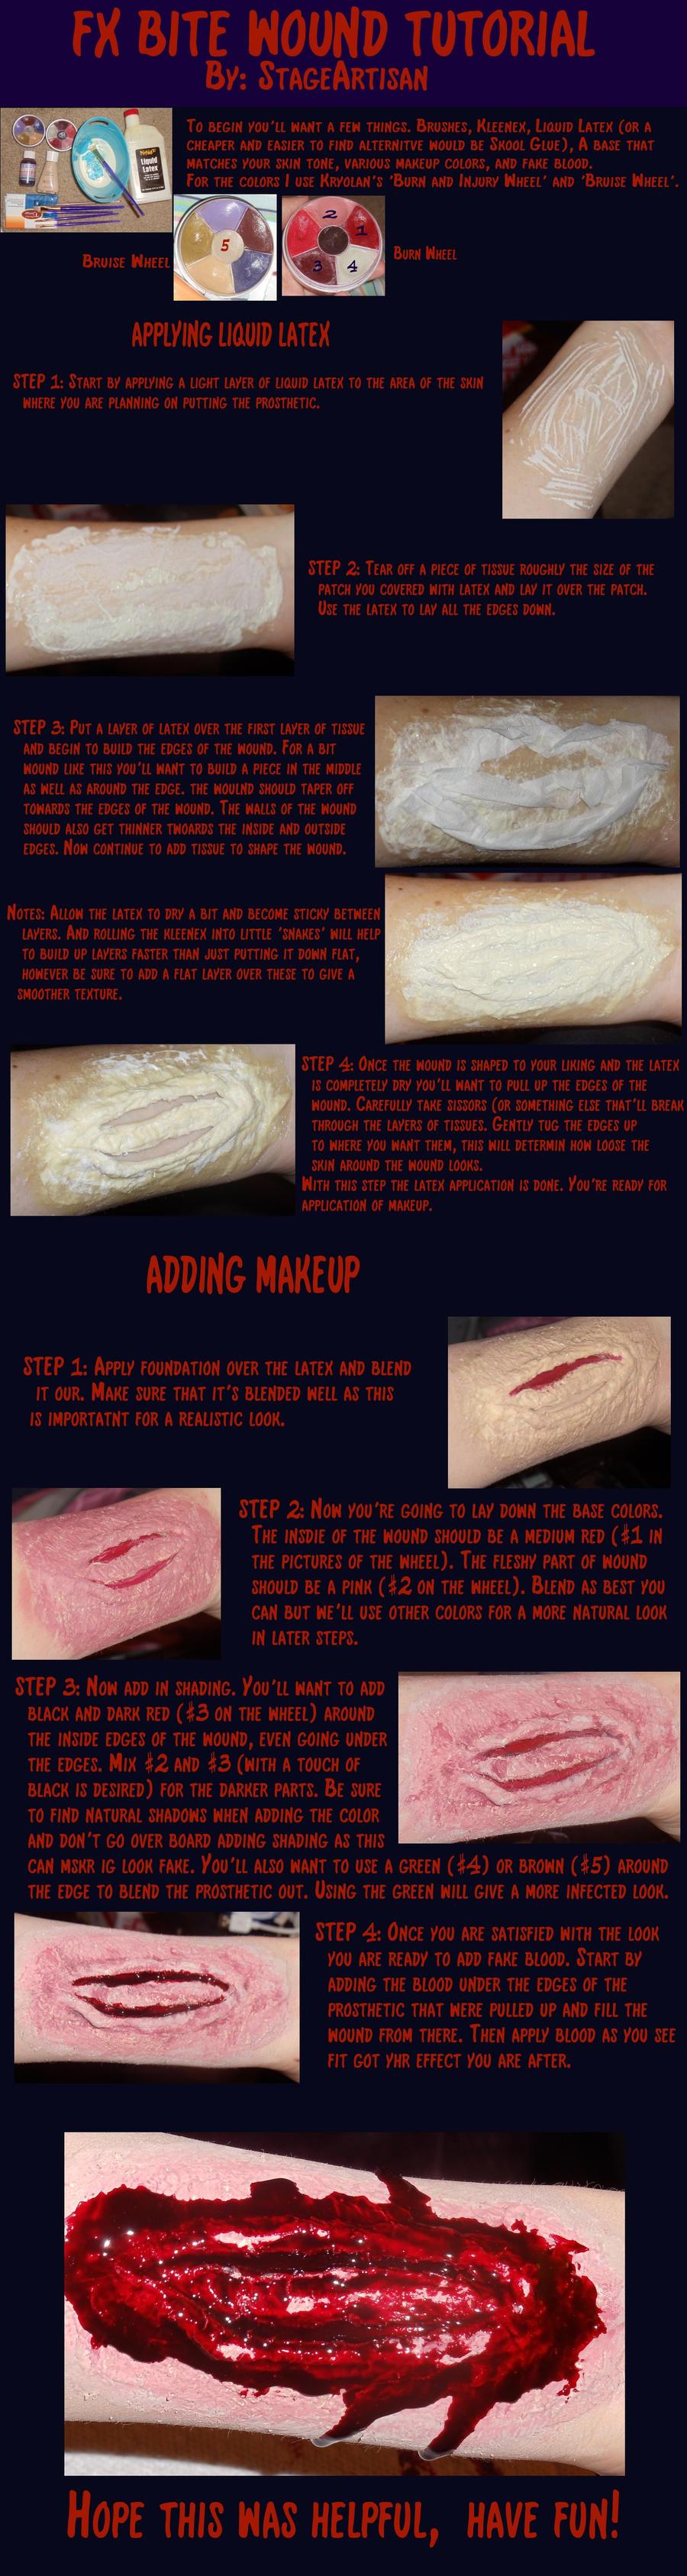 FX bite wound tutorial by StageArtisan